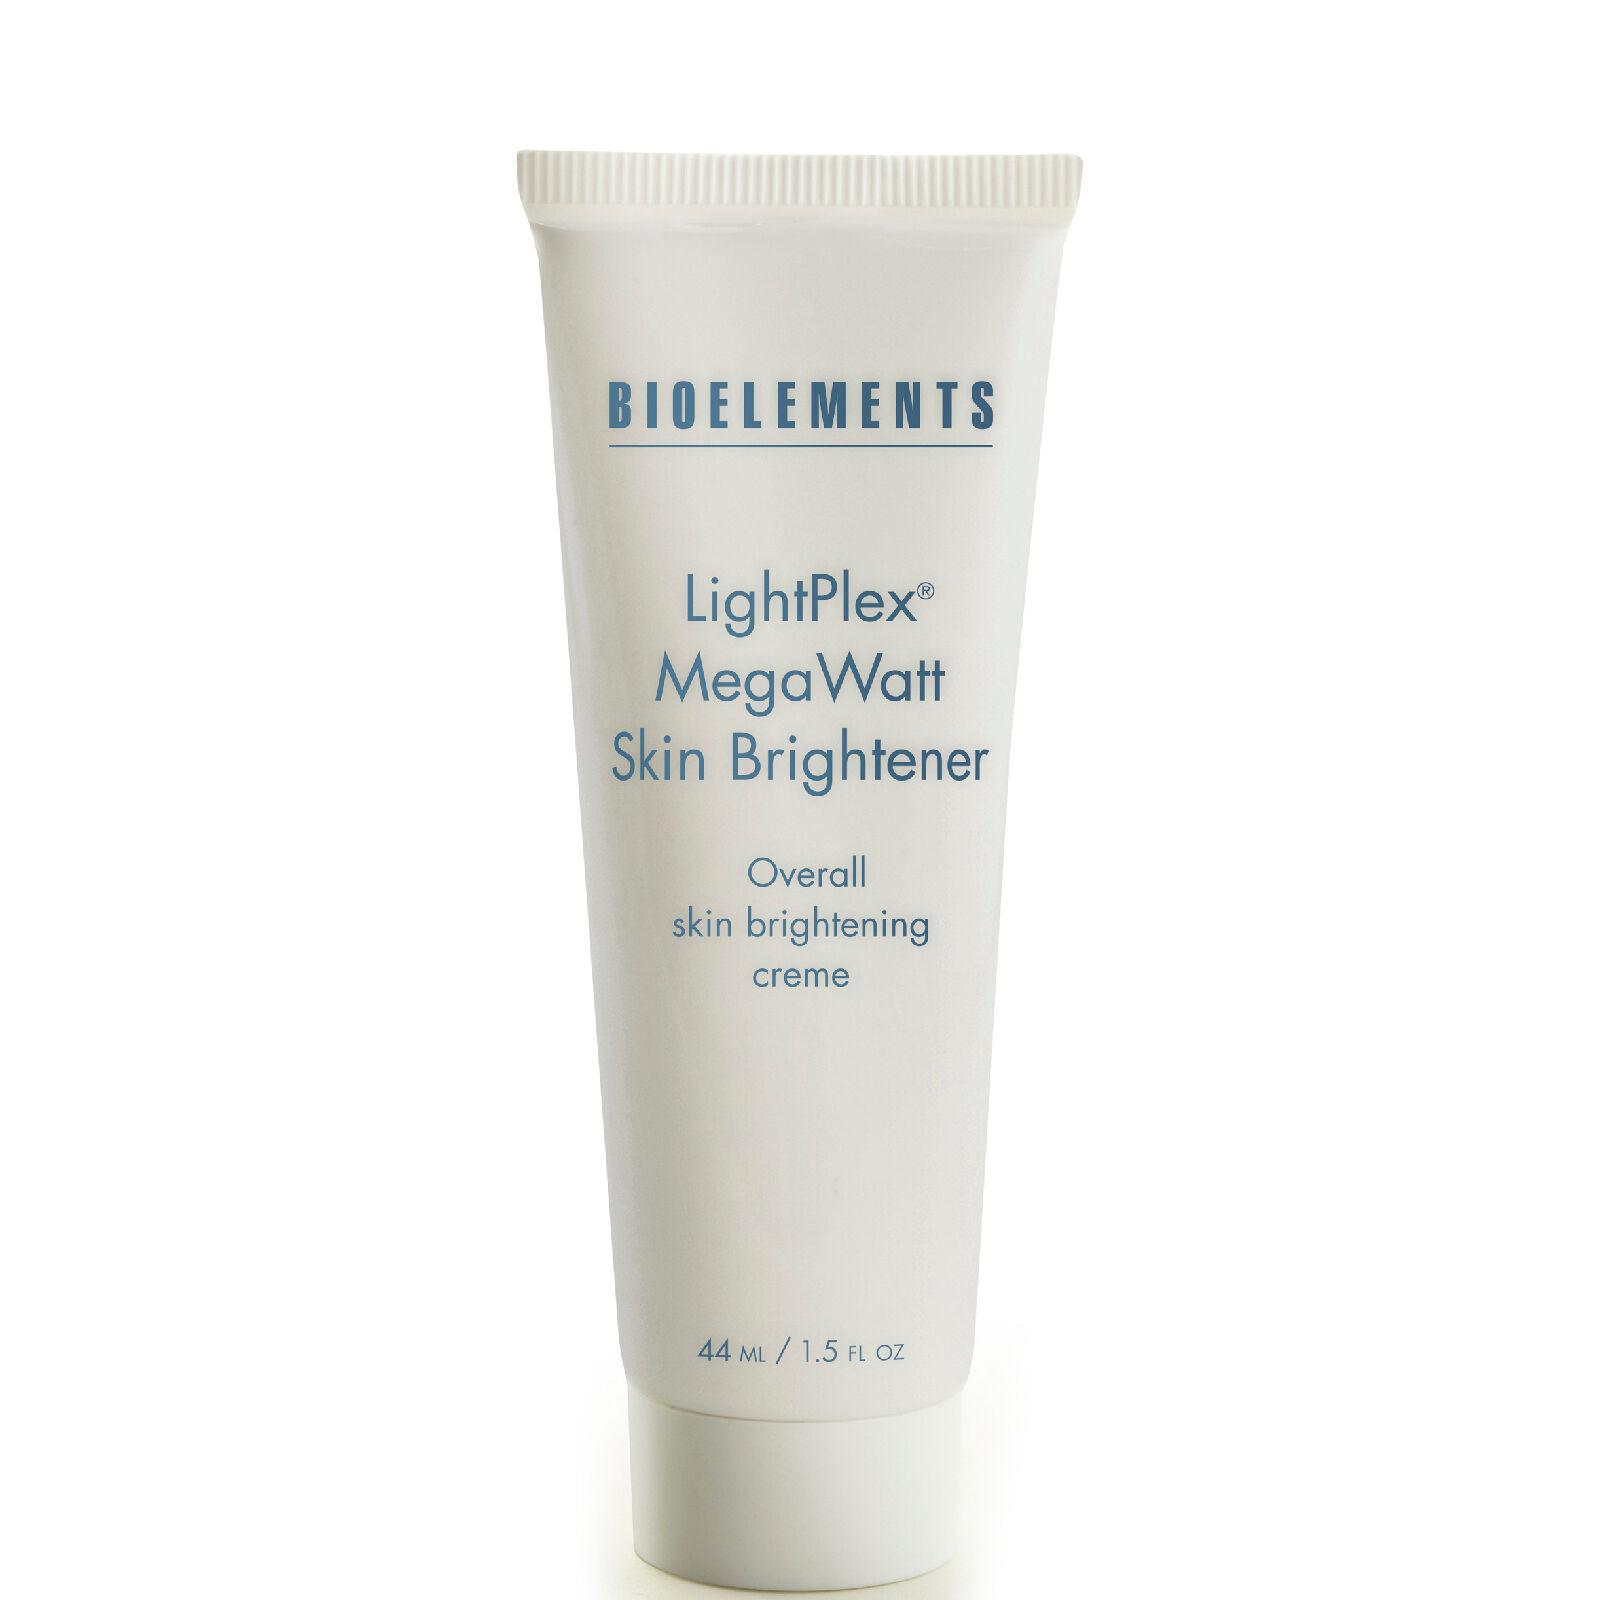 Bioelements LightPlex MegaWatt Skin Brightener